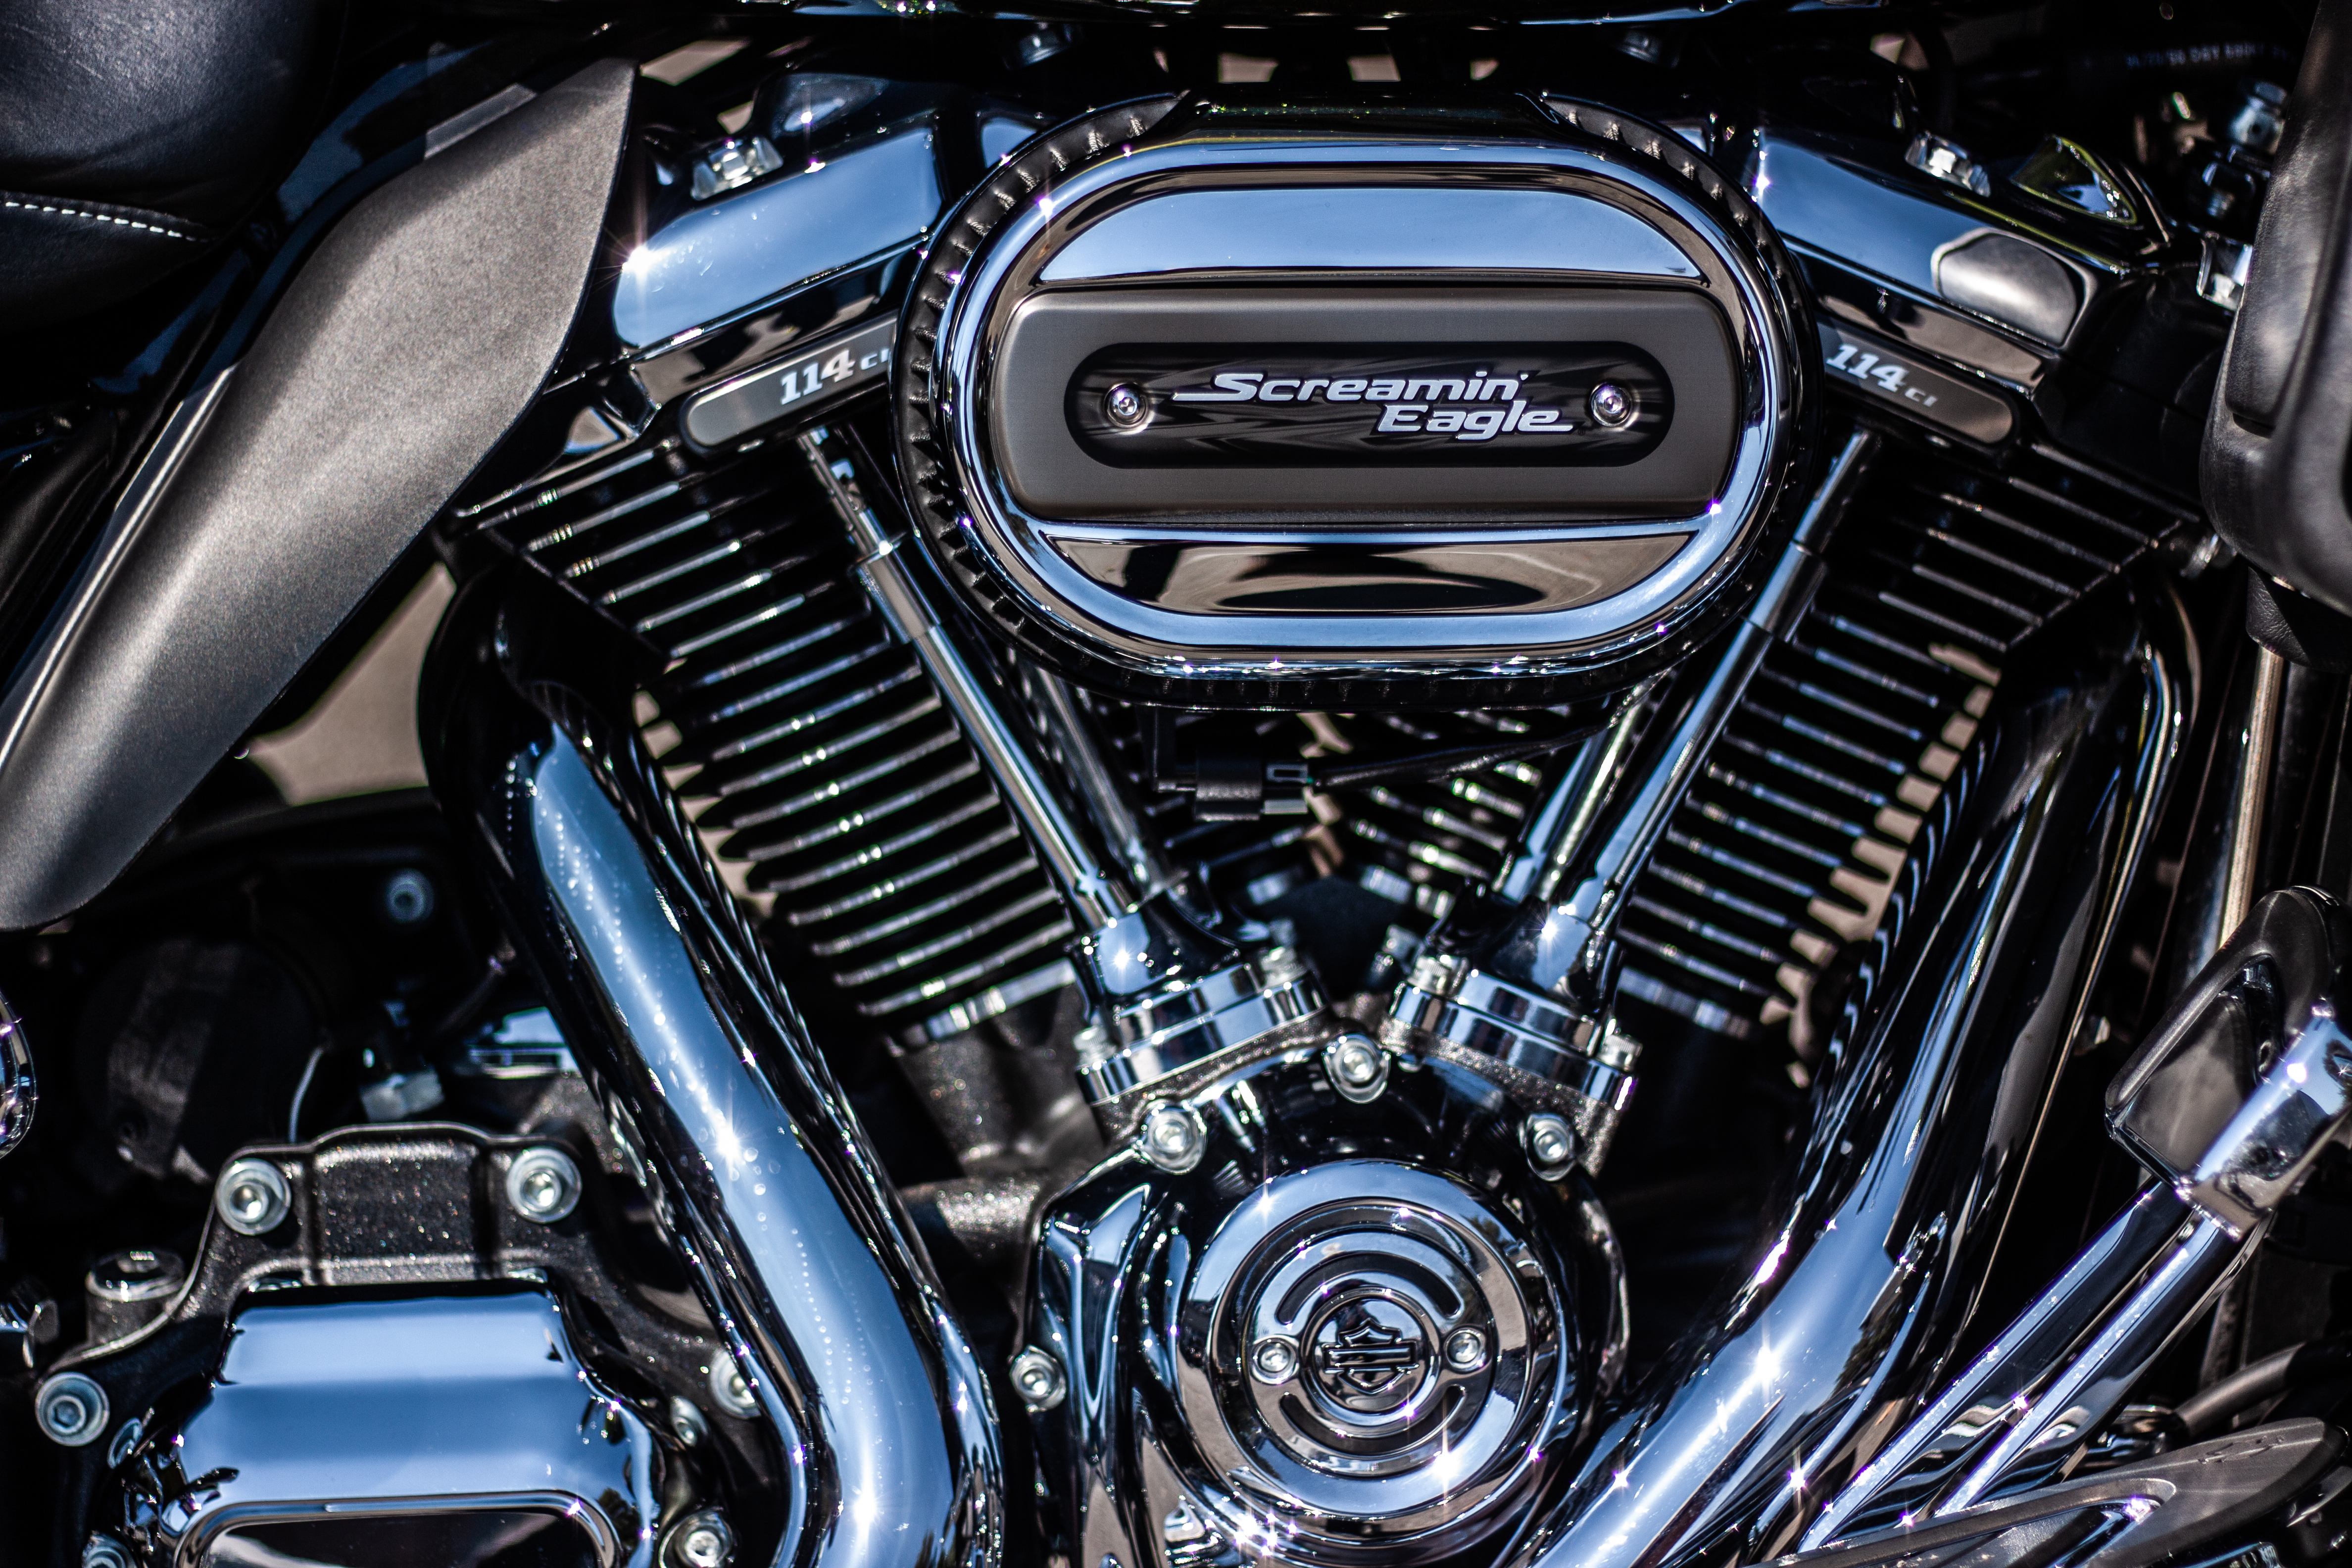 Pre-Owned 2017 Harley-Davidson CVO Limited